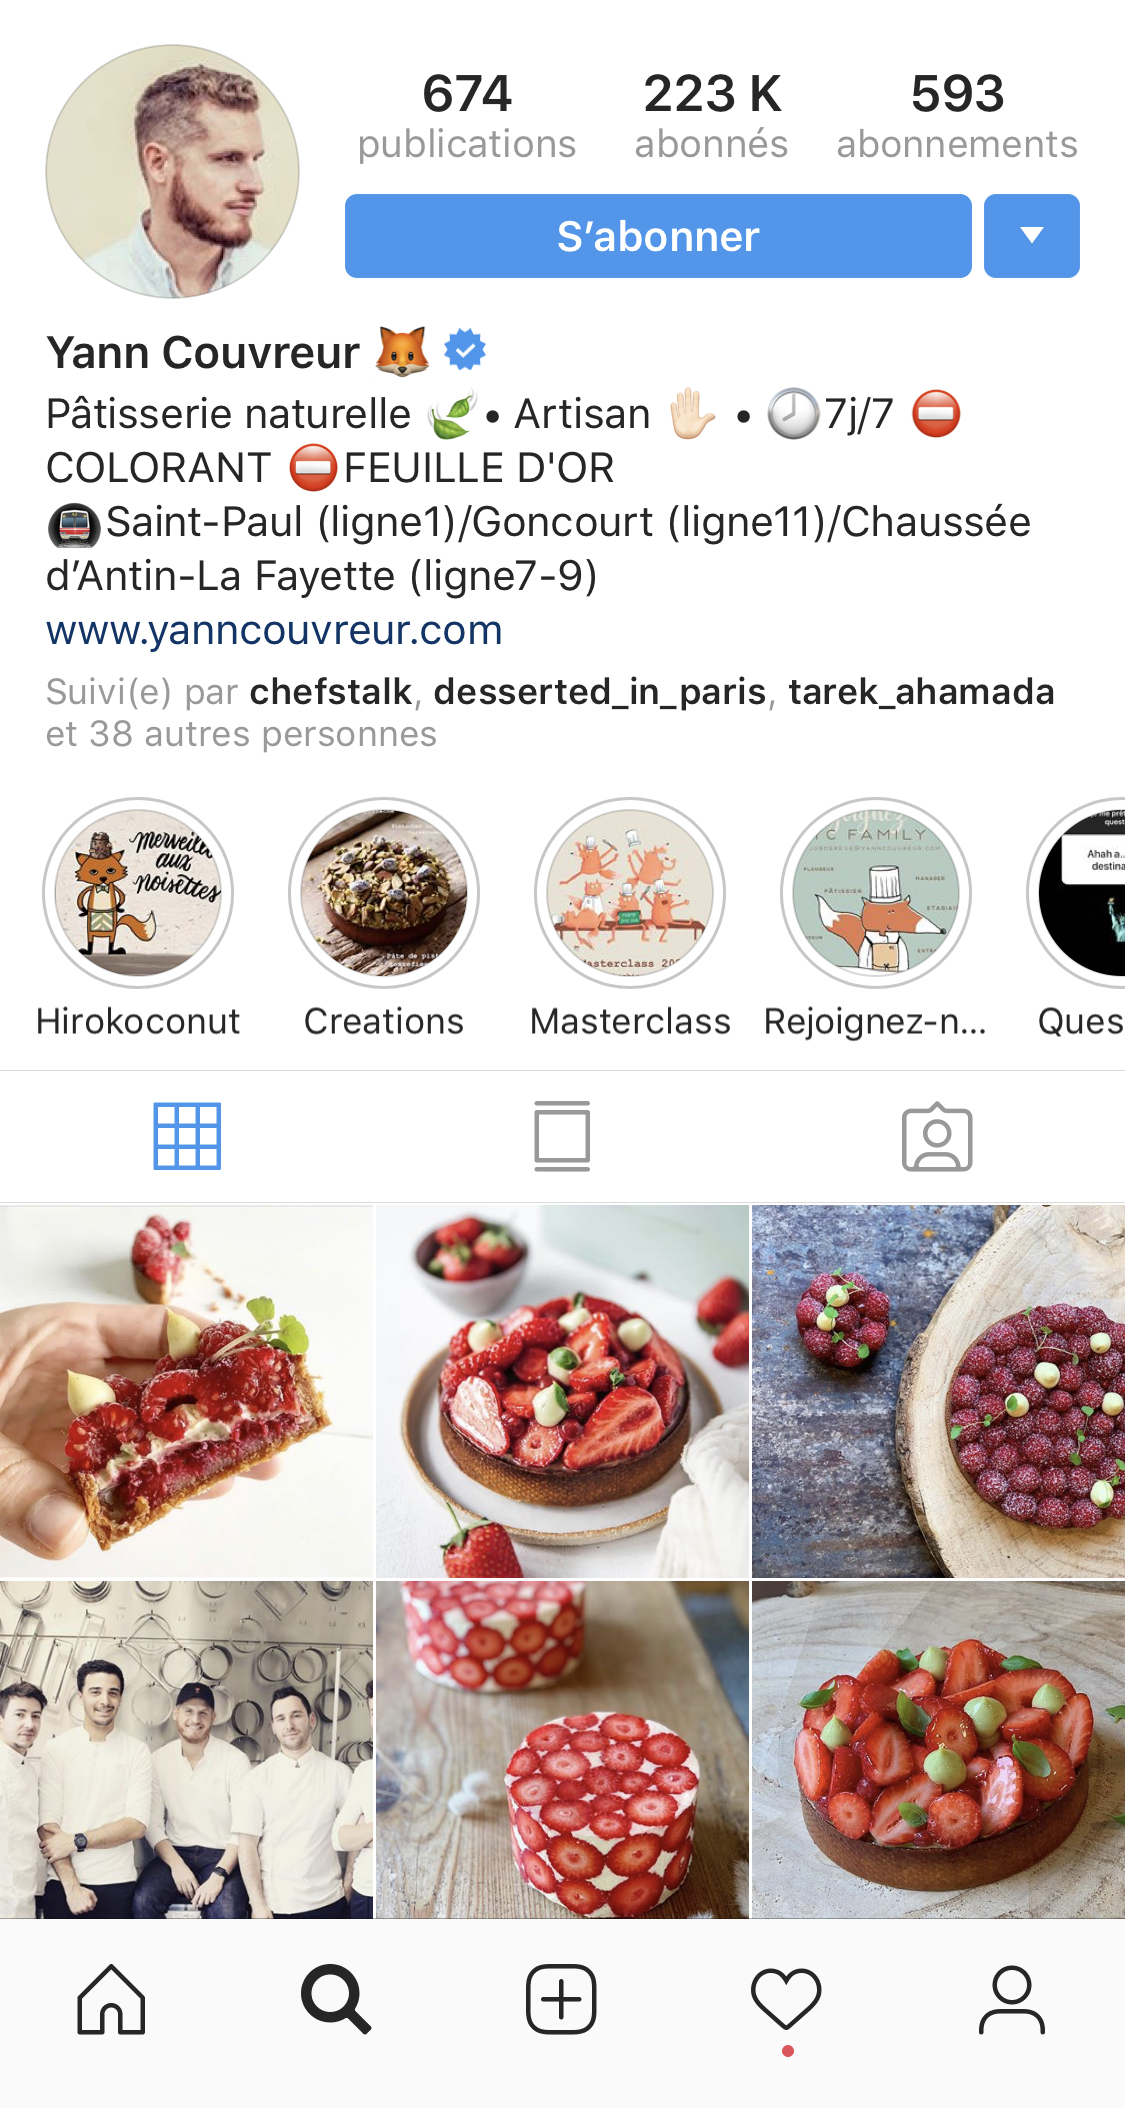 在 Instagram 上面擁有超過 22 萬追蹤人數的 Yann Couvreur 主廚。(圖片來源:Instagram| @yanncouvreur )